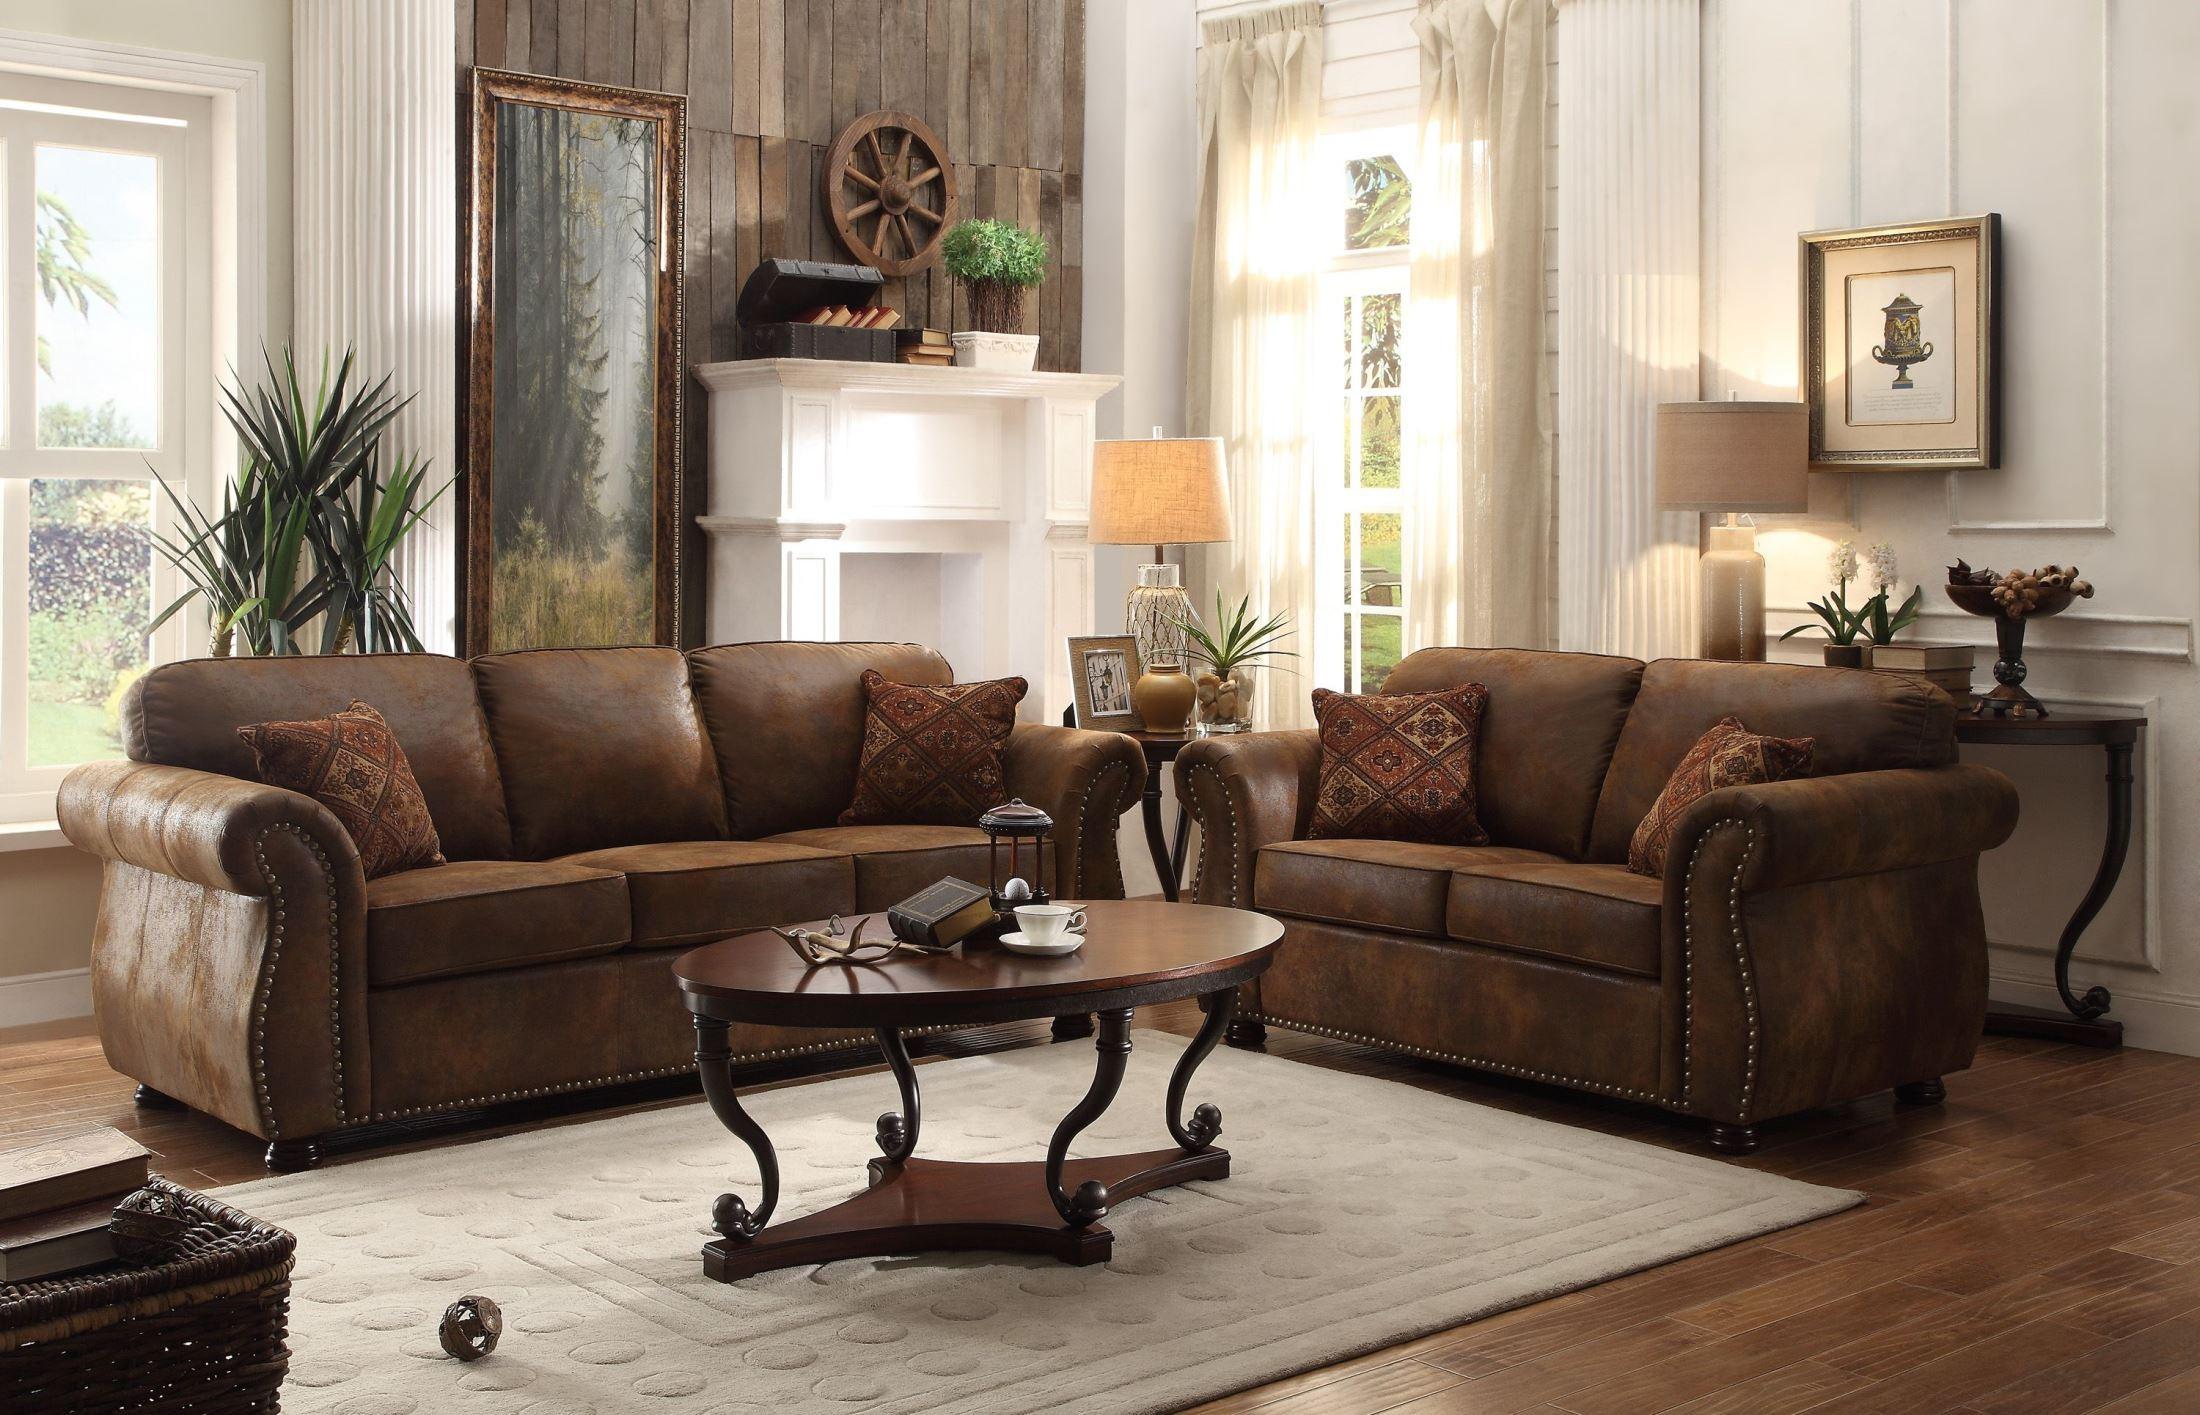 Corvallis Brown Living Room Set from Homelegance (8405BJ-3